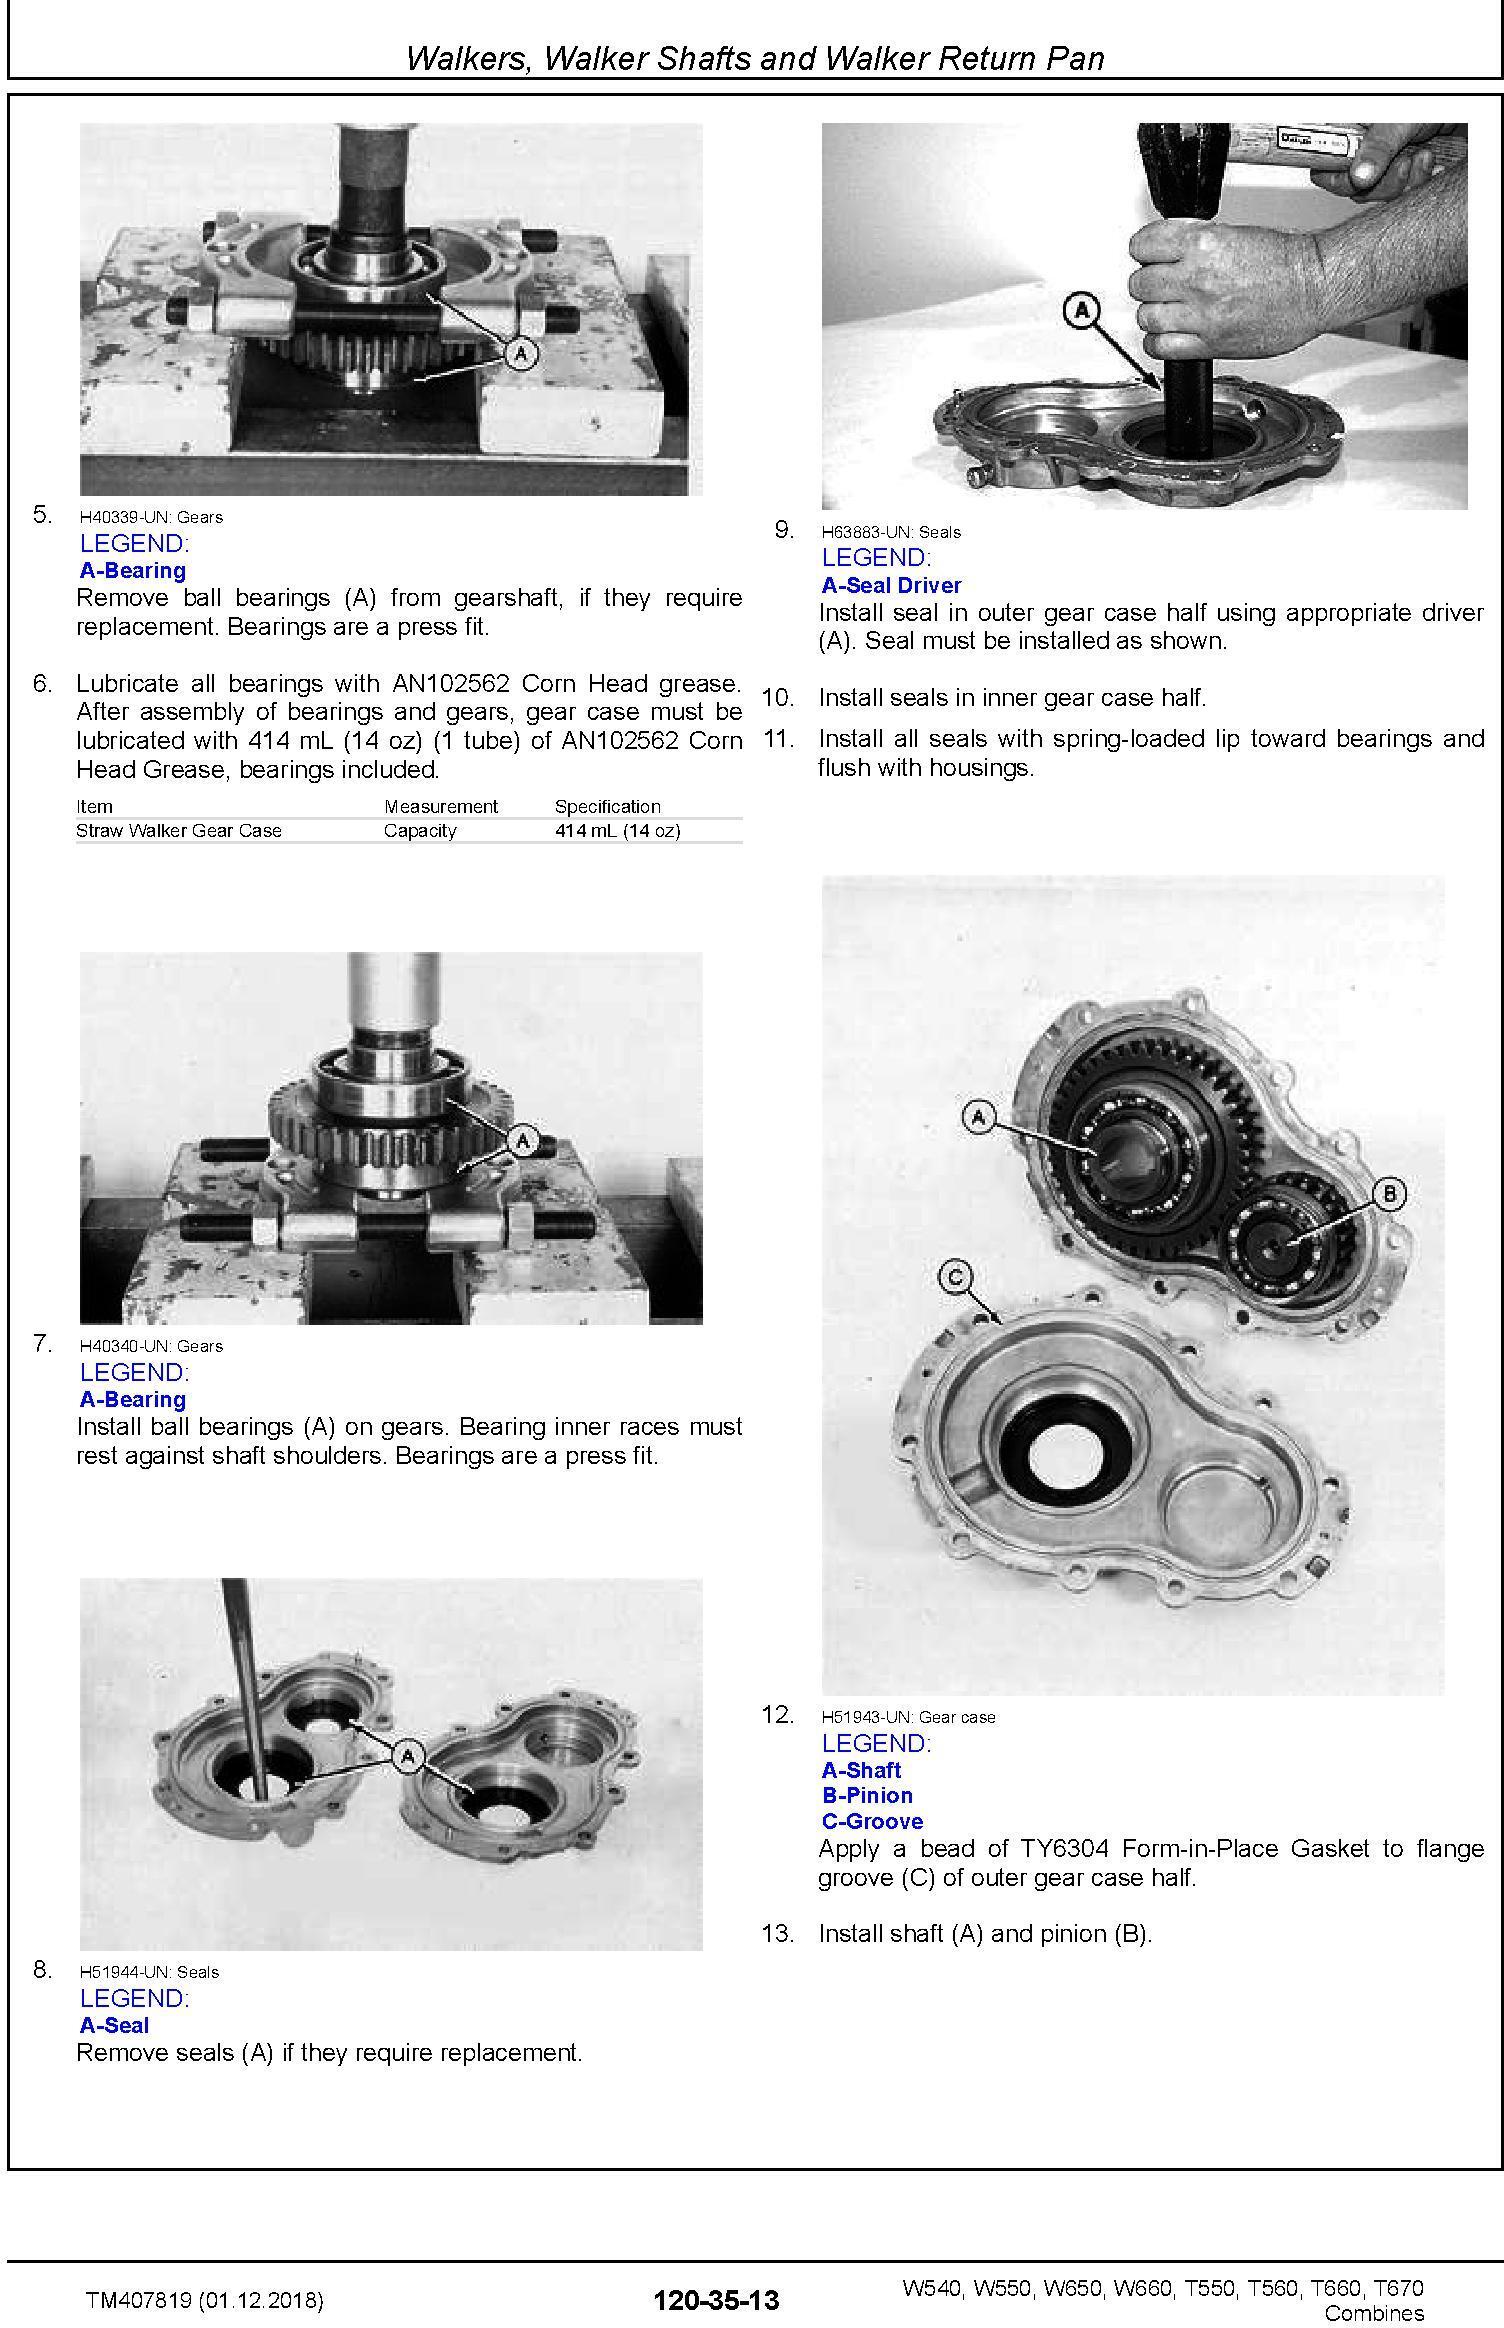 John Deere W540, W550, W650, W660, T550, T560, T660, T670 Combine Repair Technical Manual (TM407819) - 3